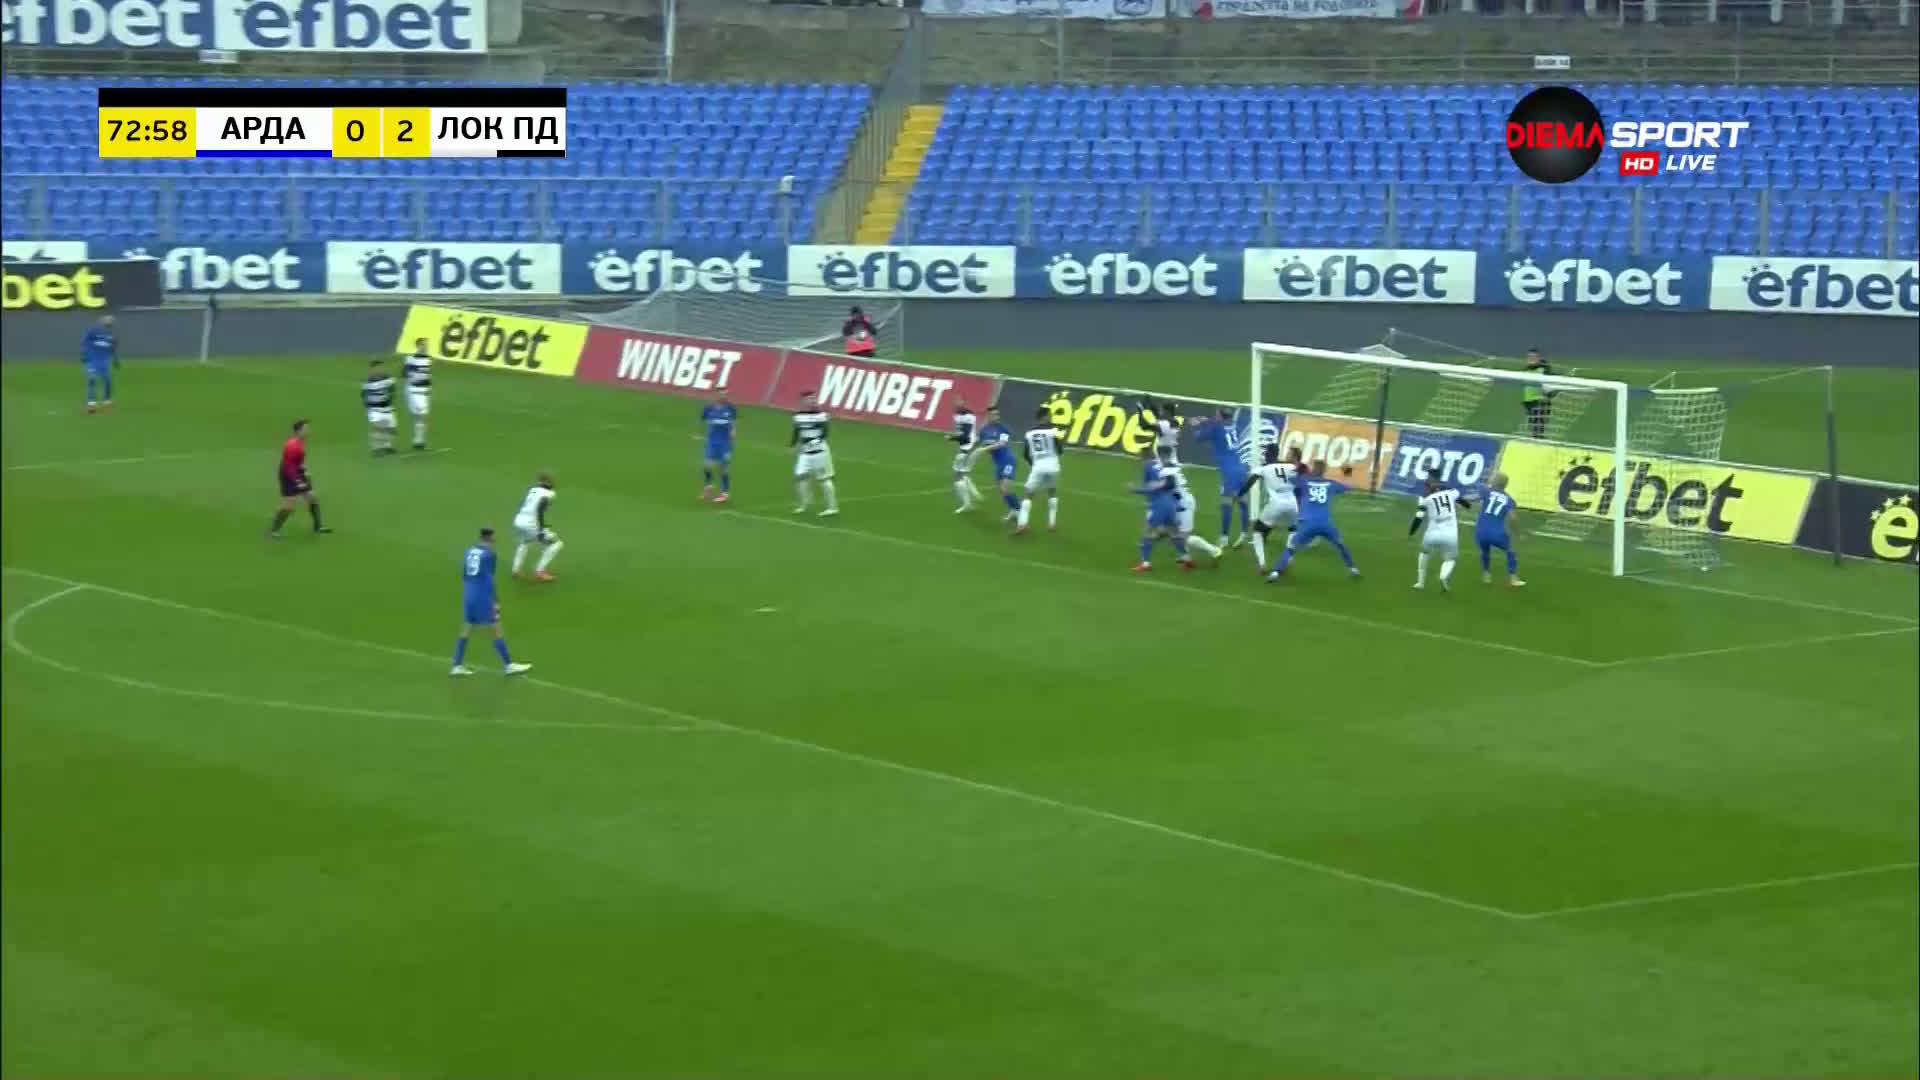 Арда - Локомотив Пловдив 0:2 /репортаж/